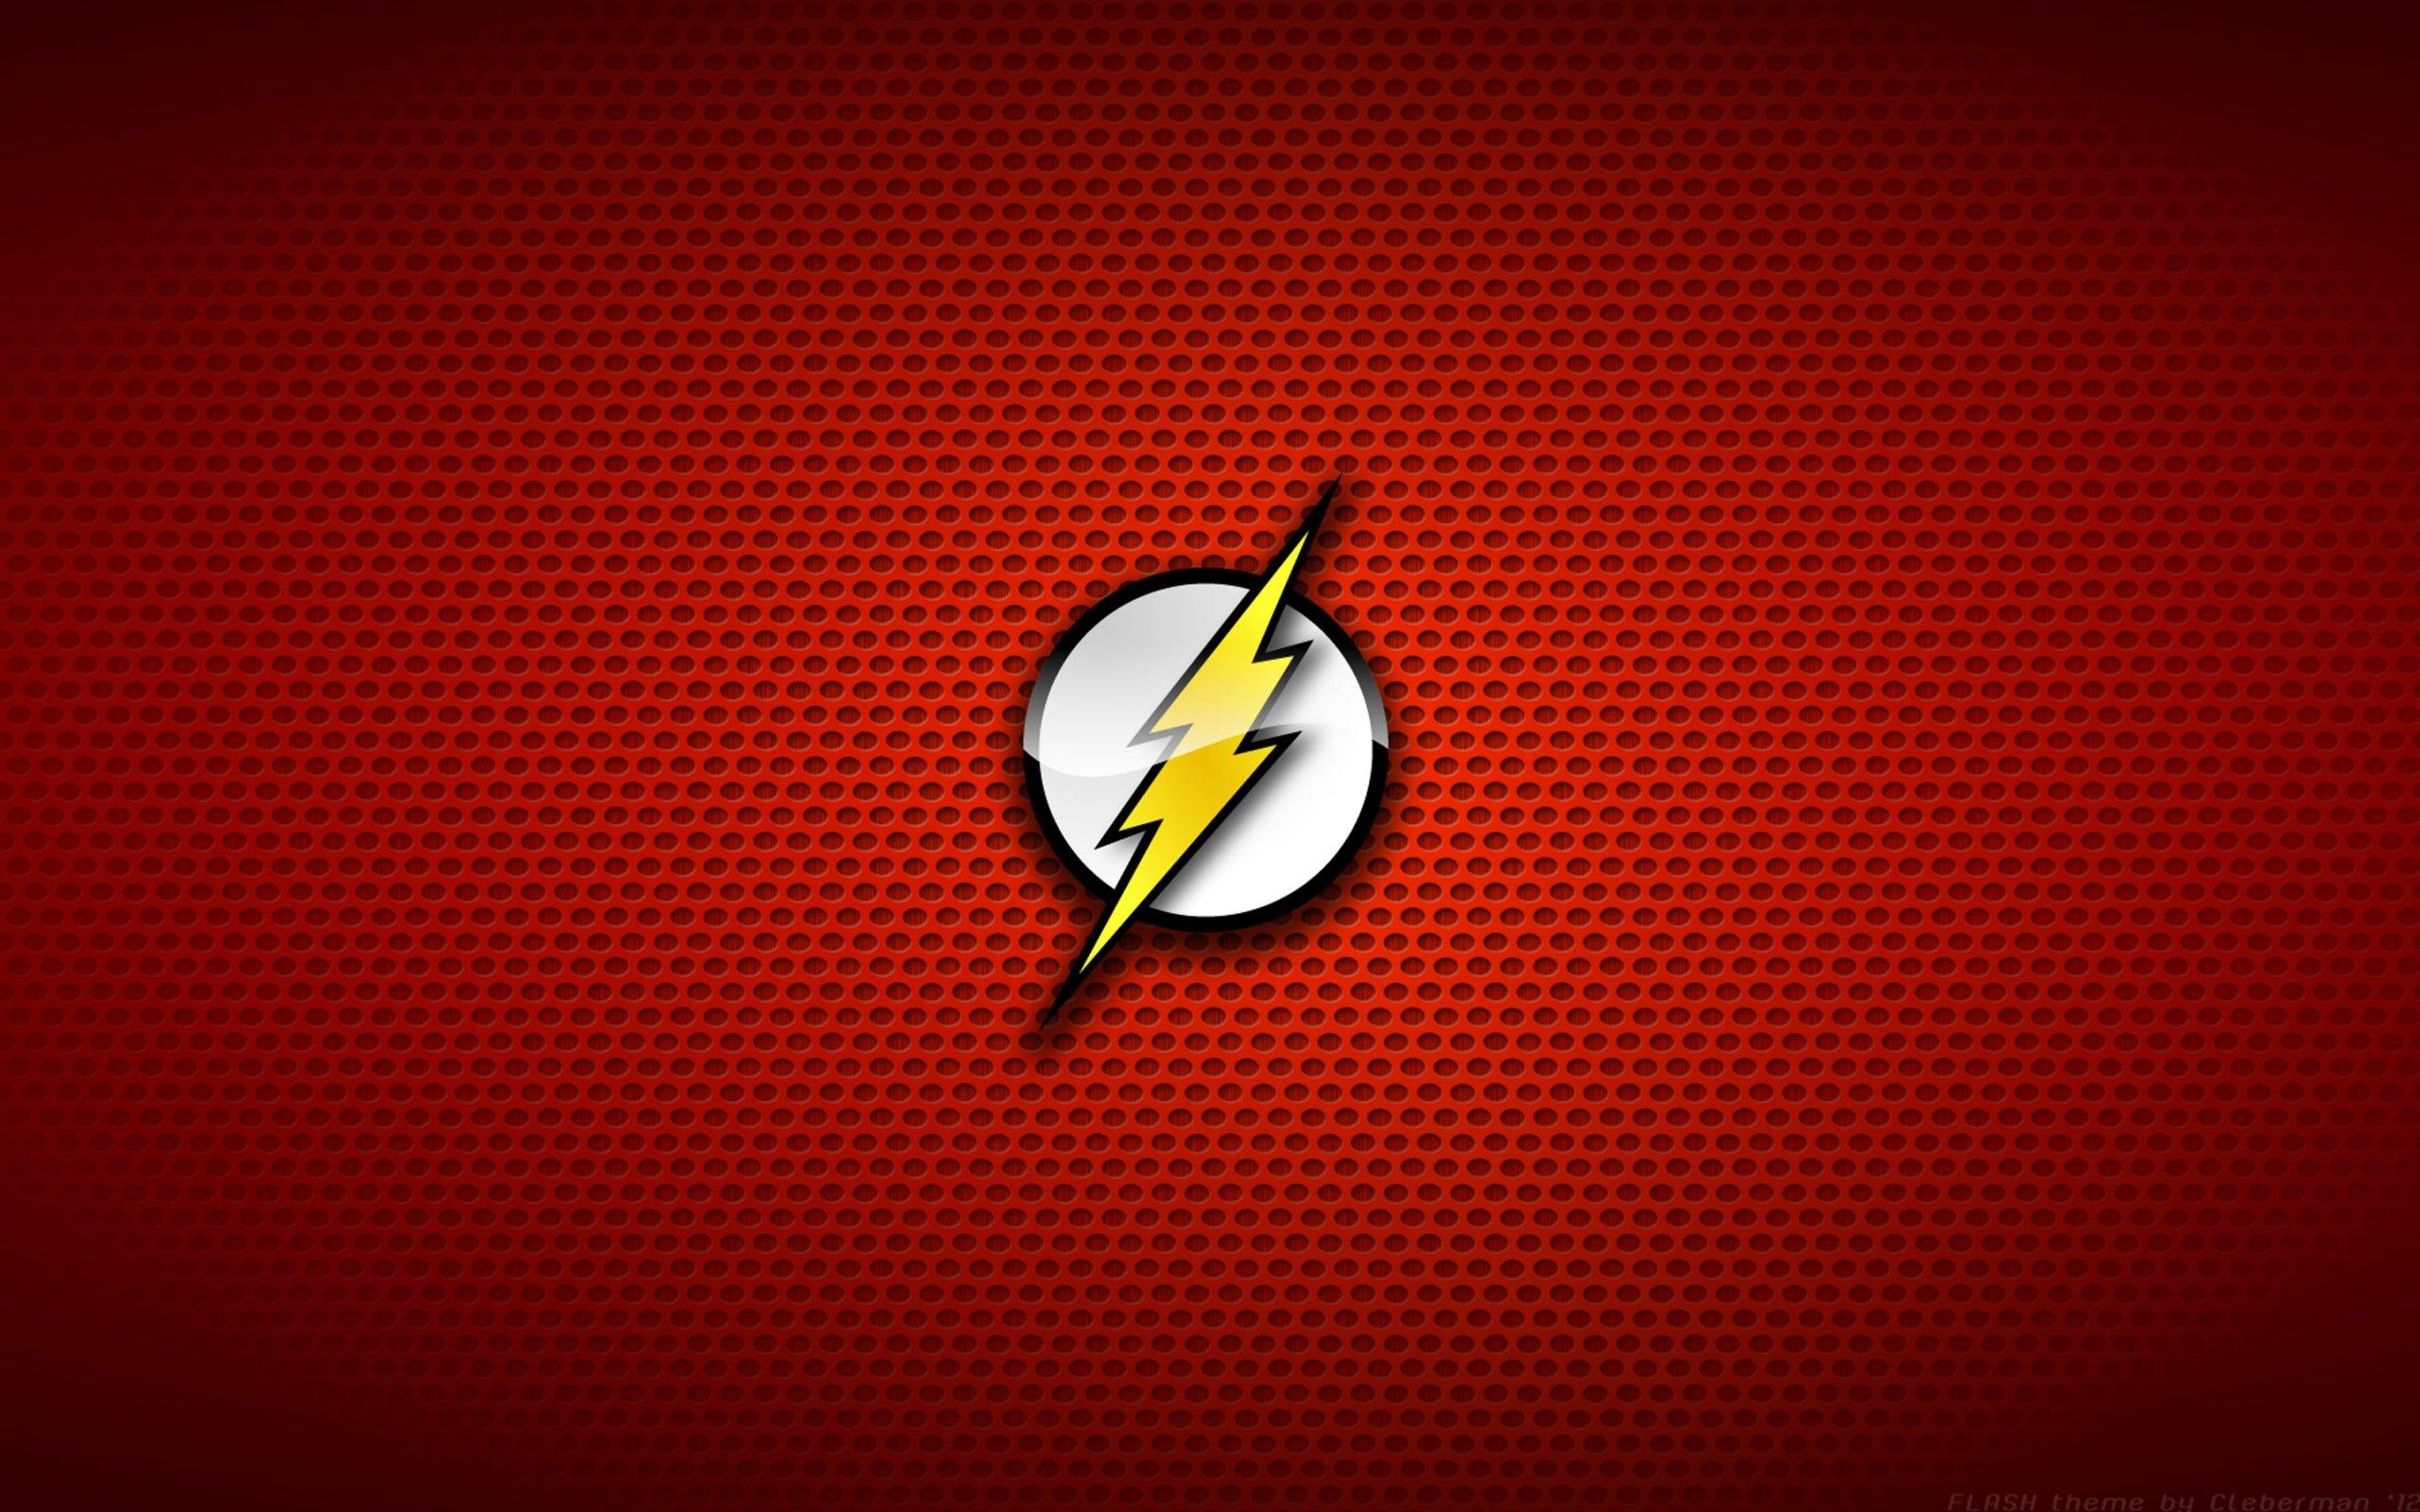 The Flash Logo Wallpaper Hd image gallery 2560x1600